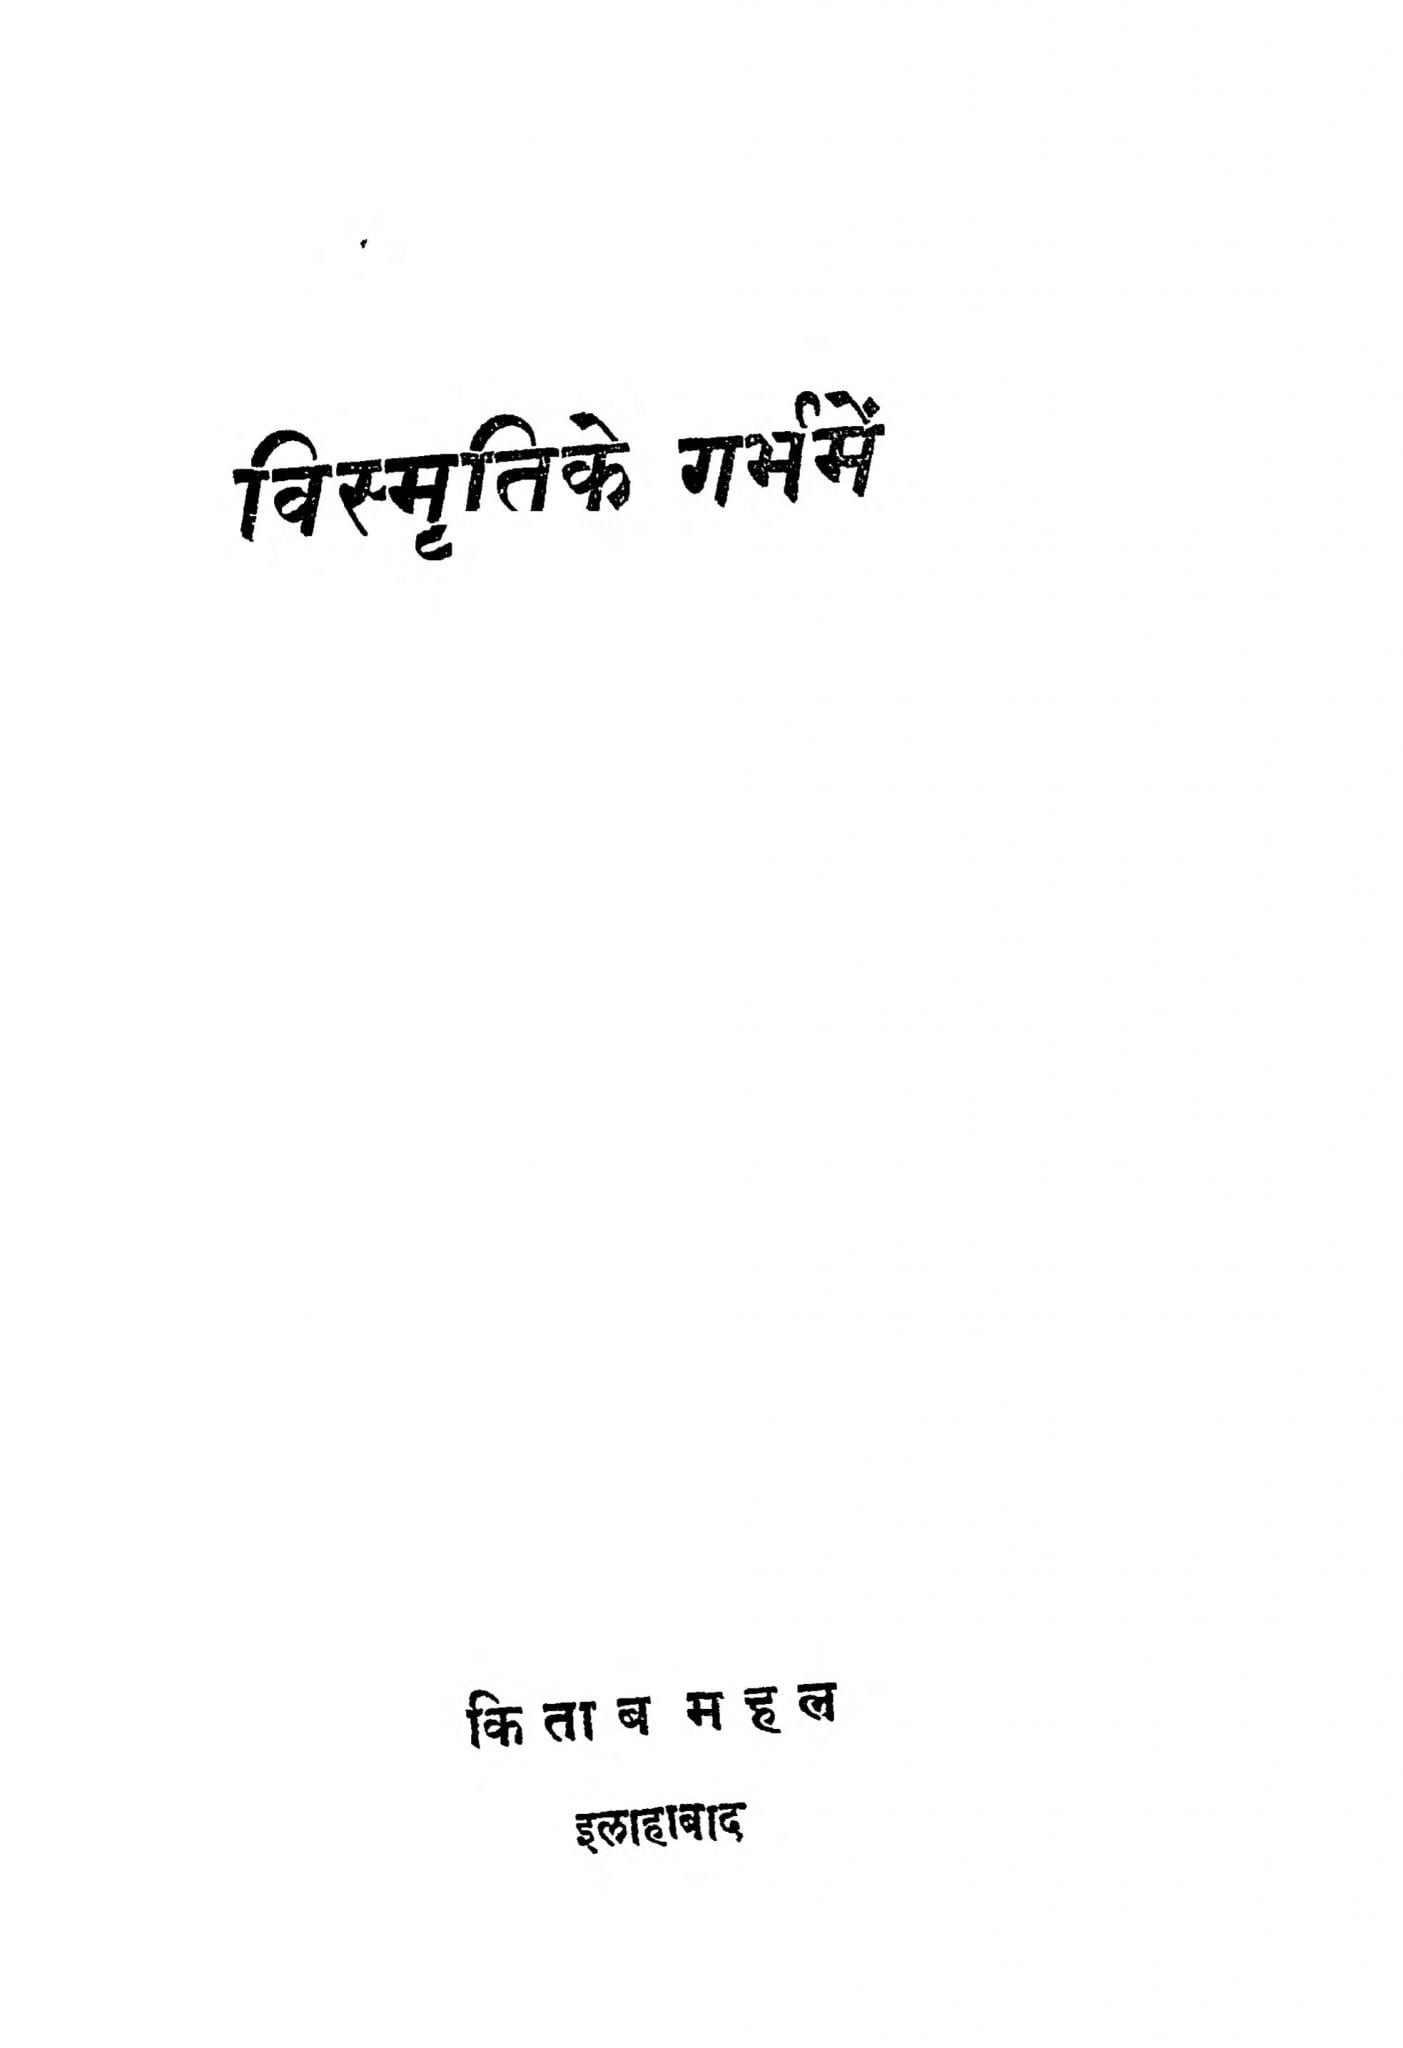 Vishmriti Ke Garbh Me by राहुल सांकृत्यायन - Rahul Sankrityayan